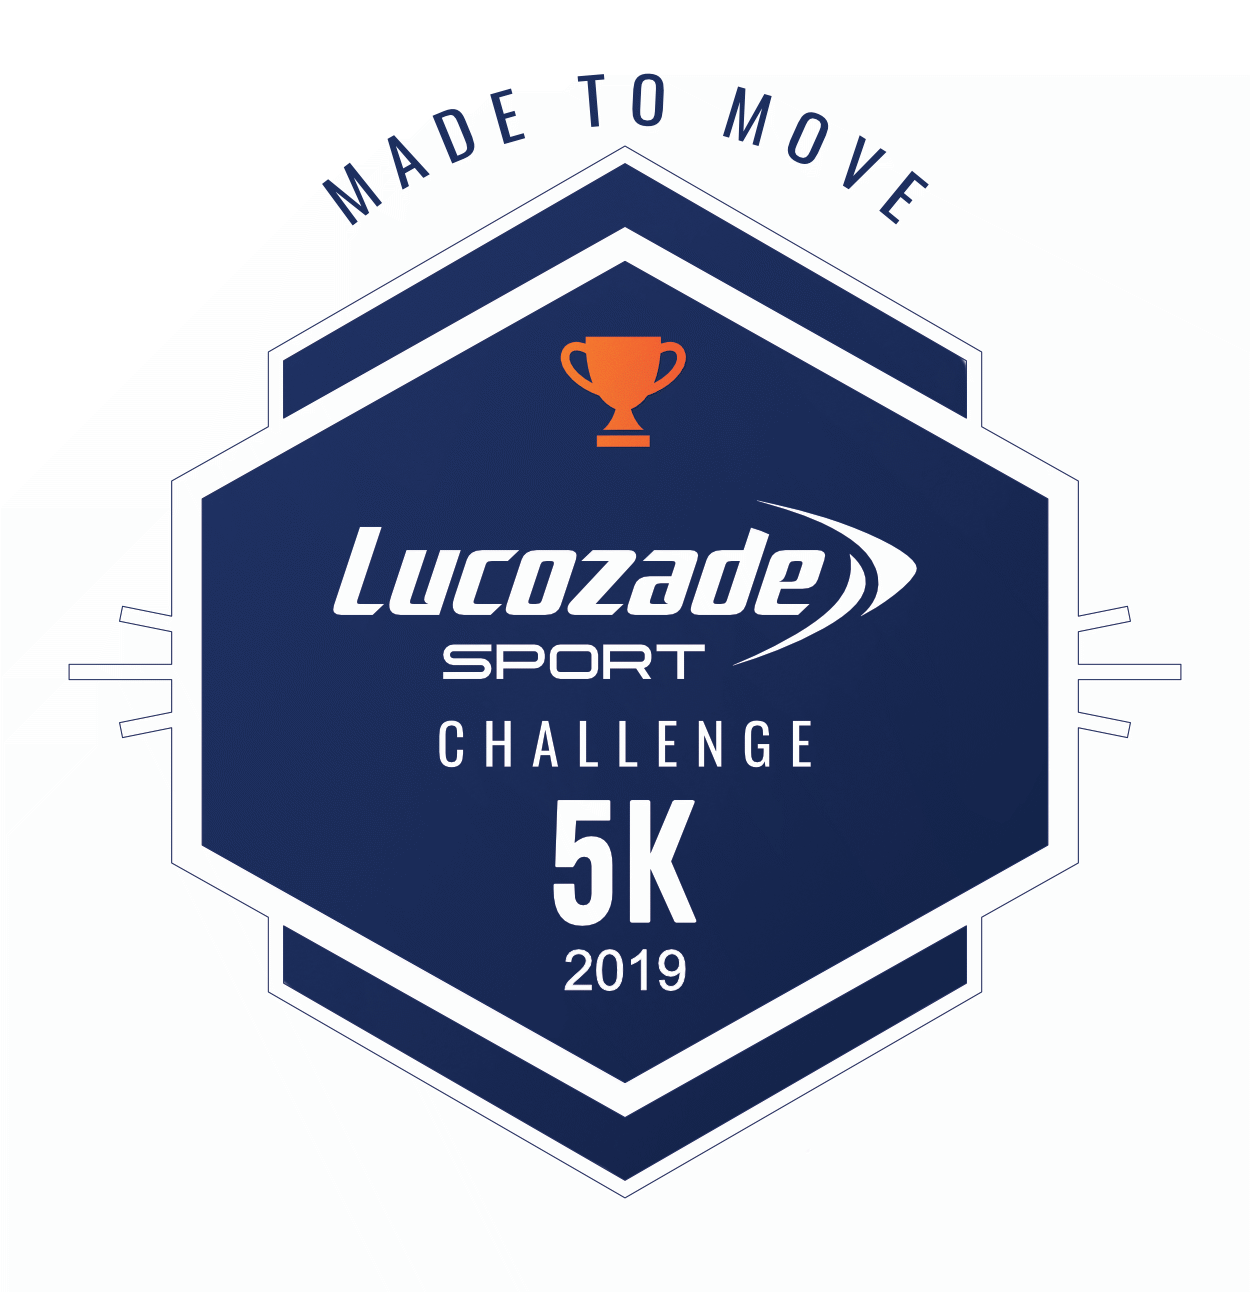 Lucozade Sport #MadetoMove Challenge logo